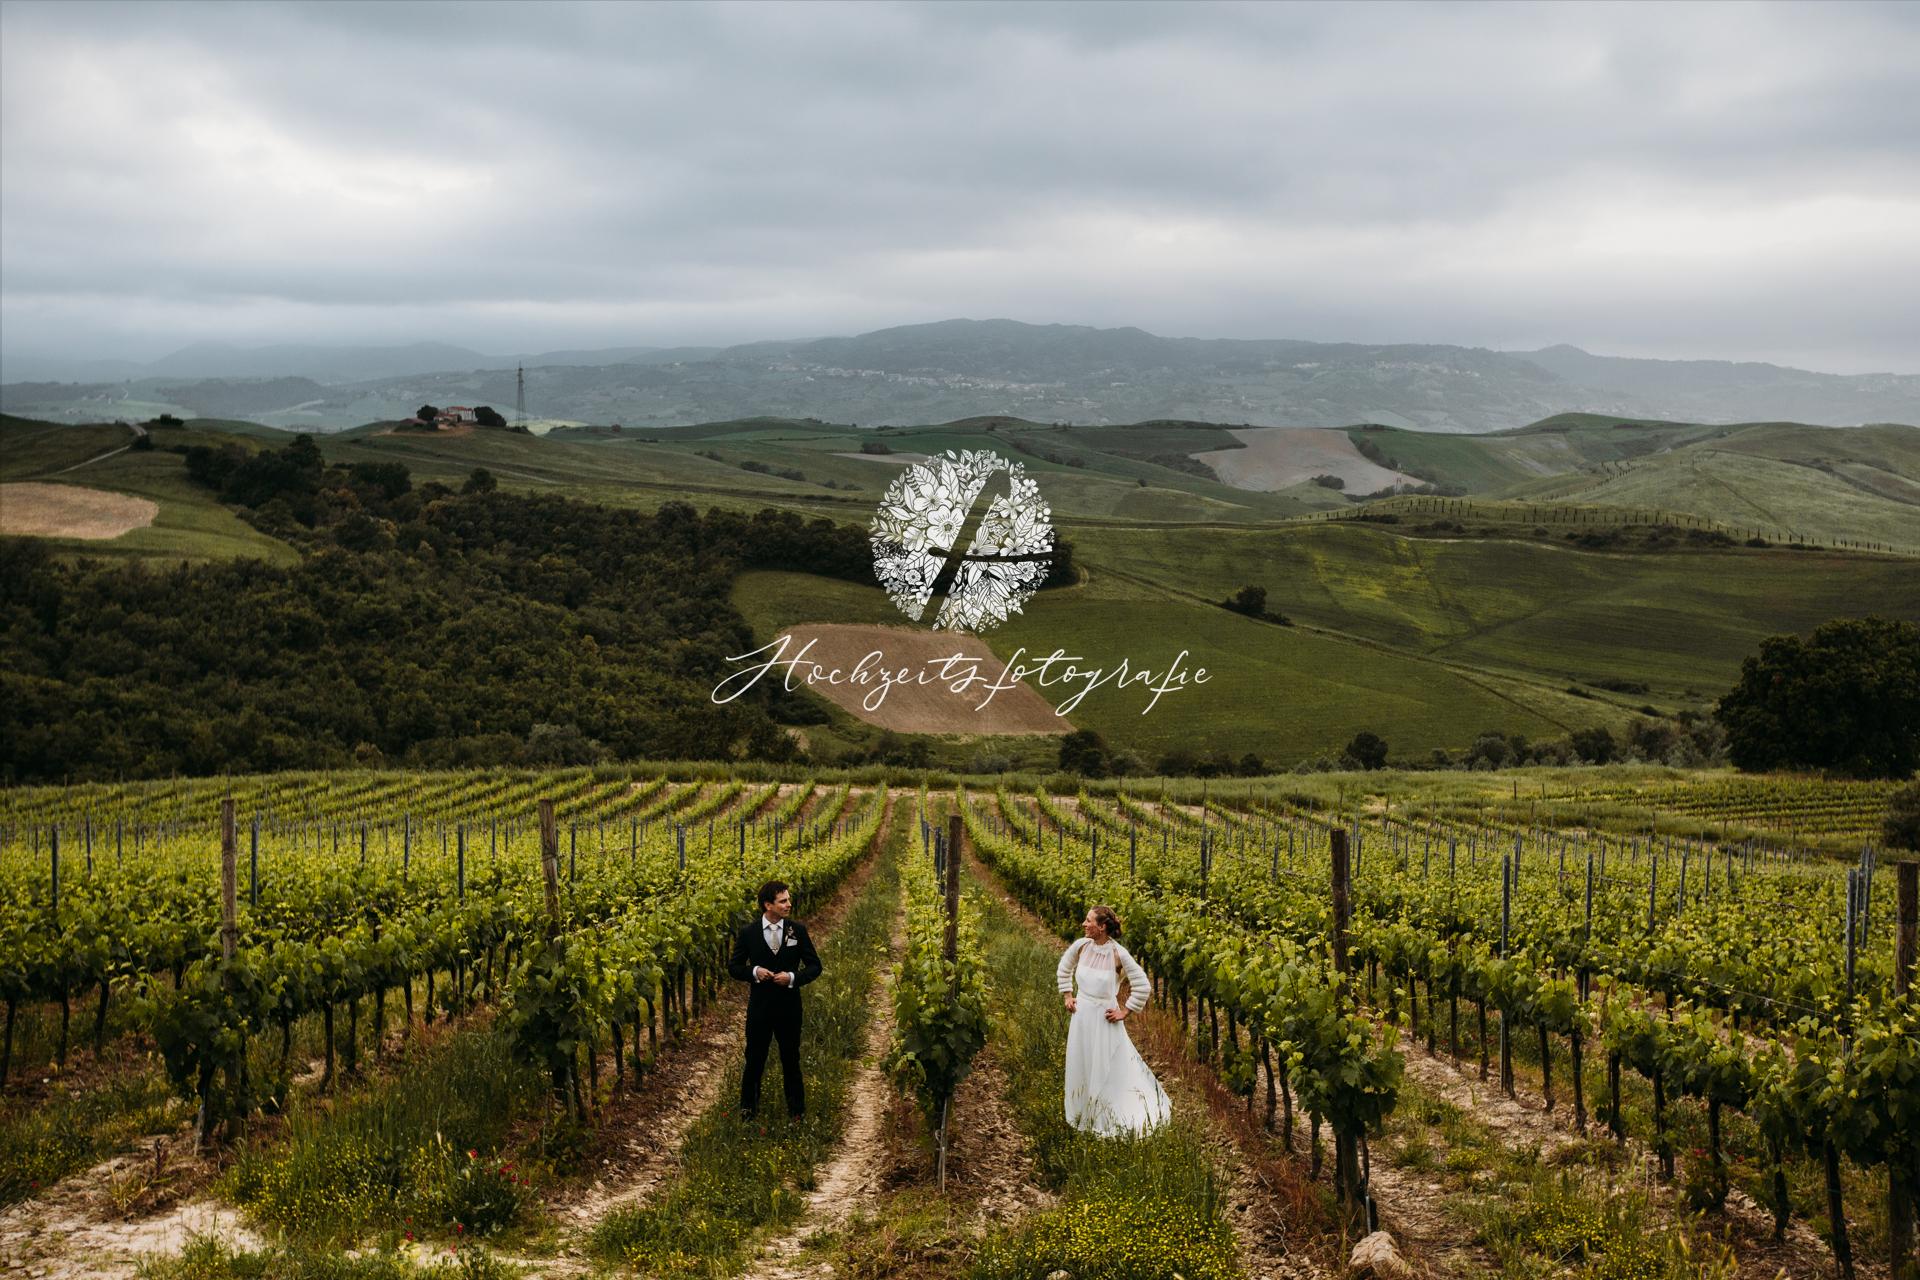 fotonen_Hochzeitsfotograf_leipzig-tuscany